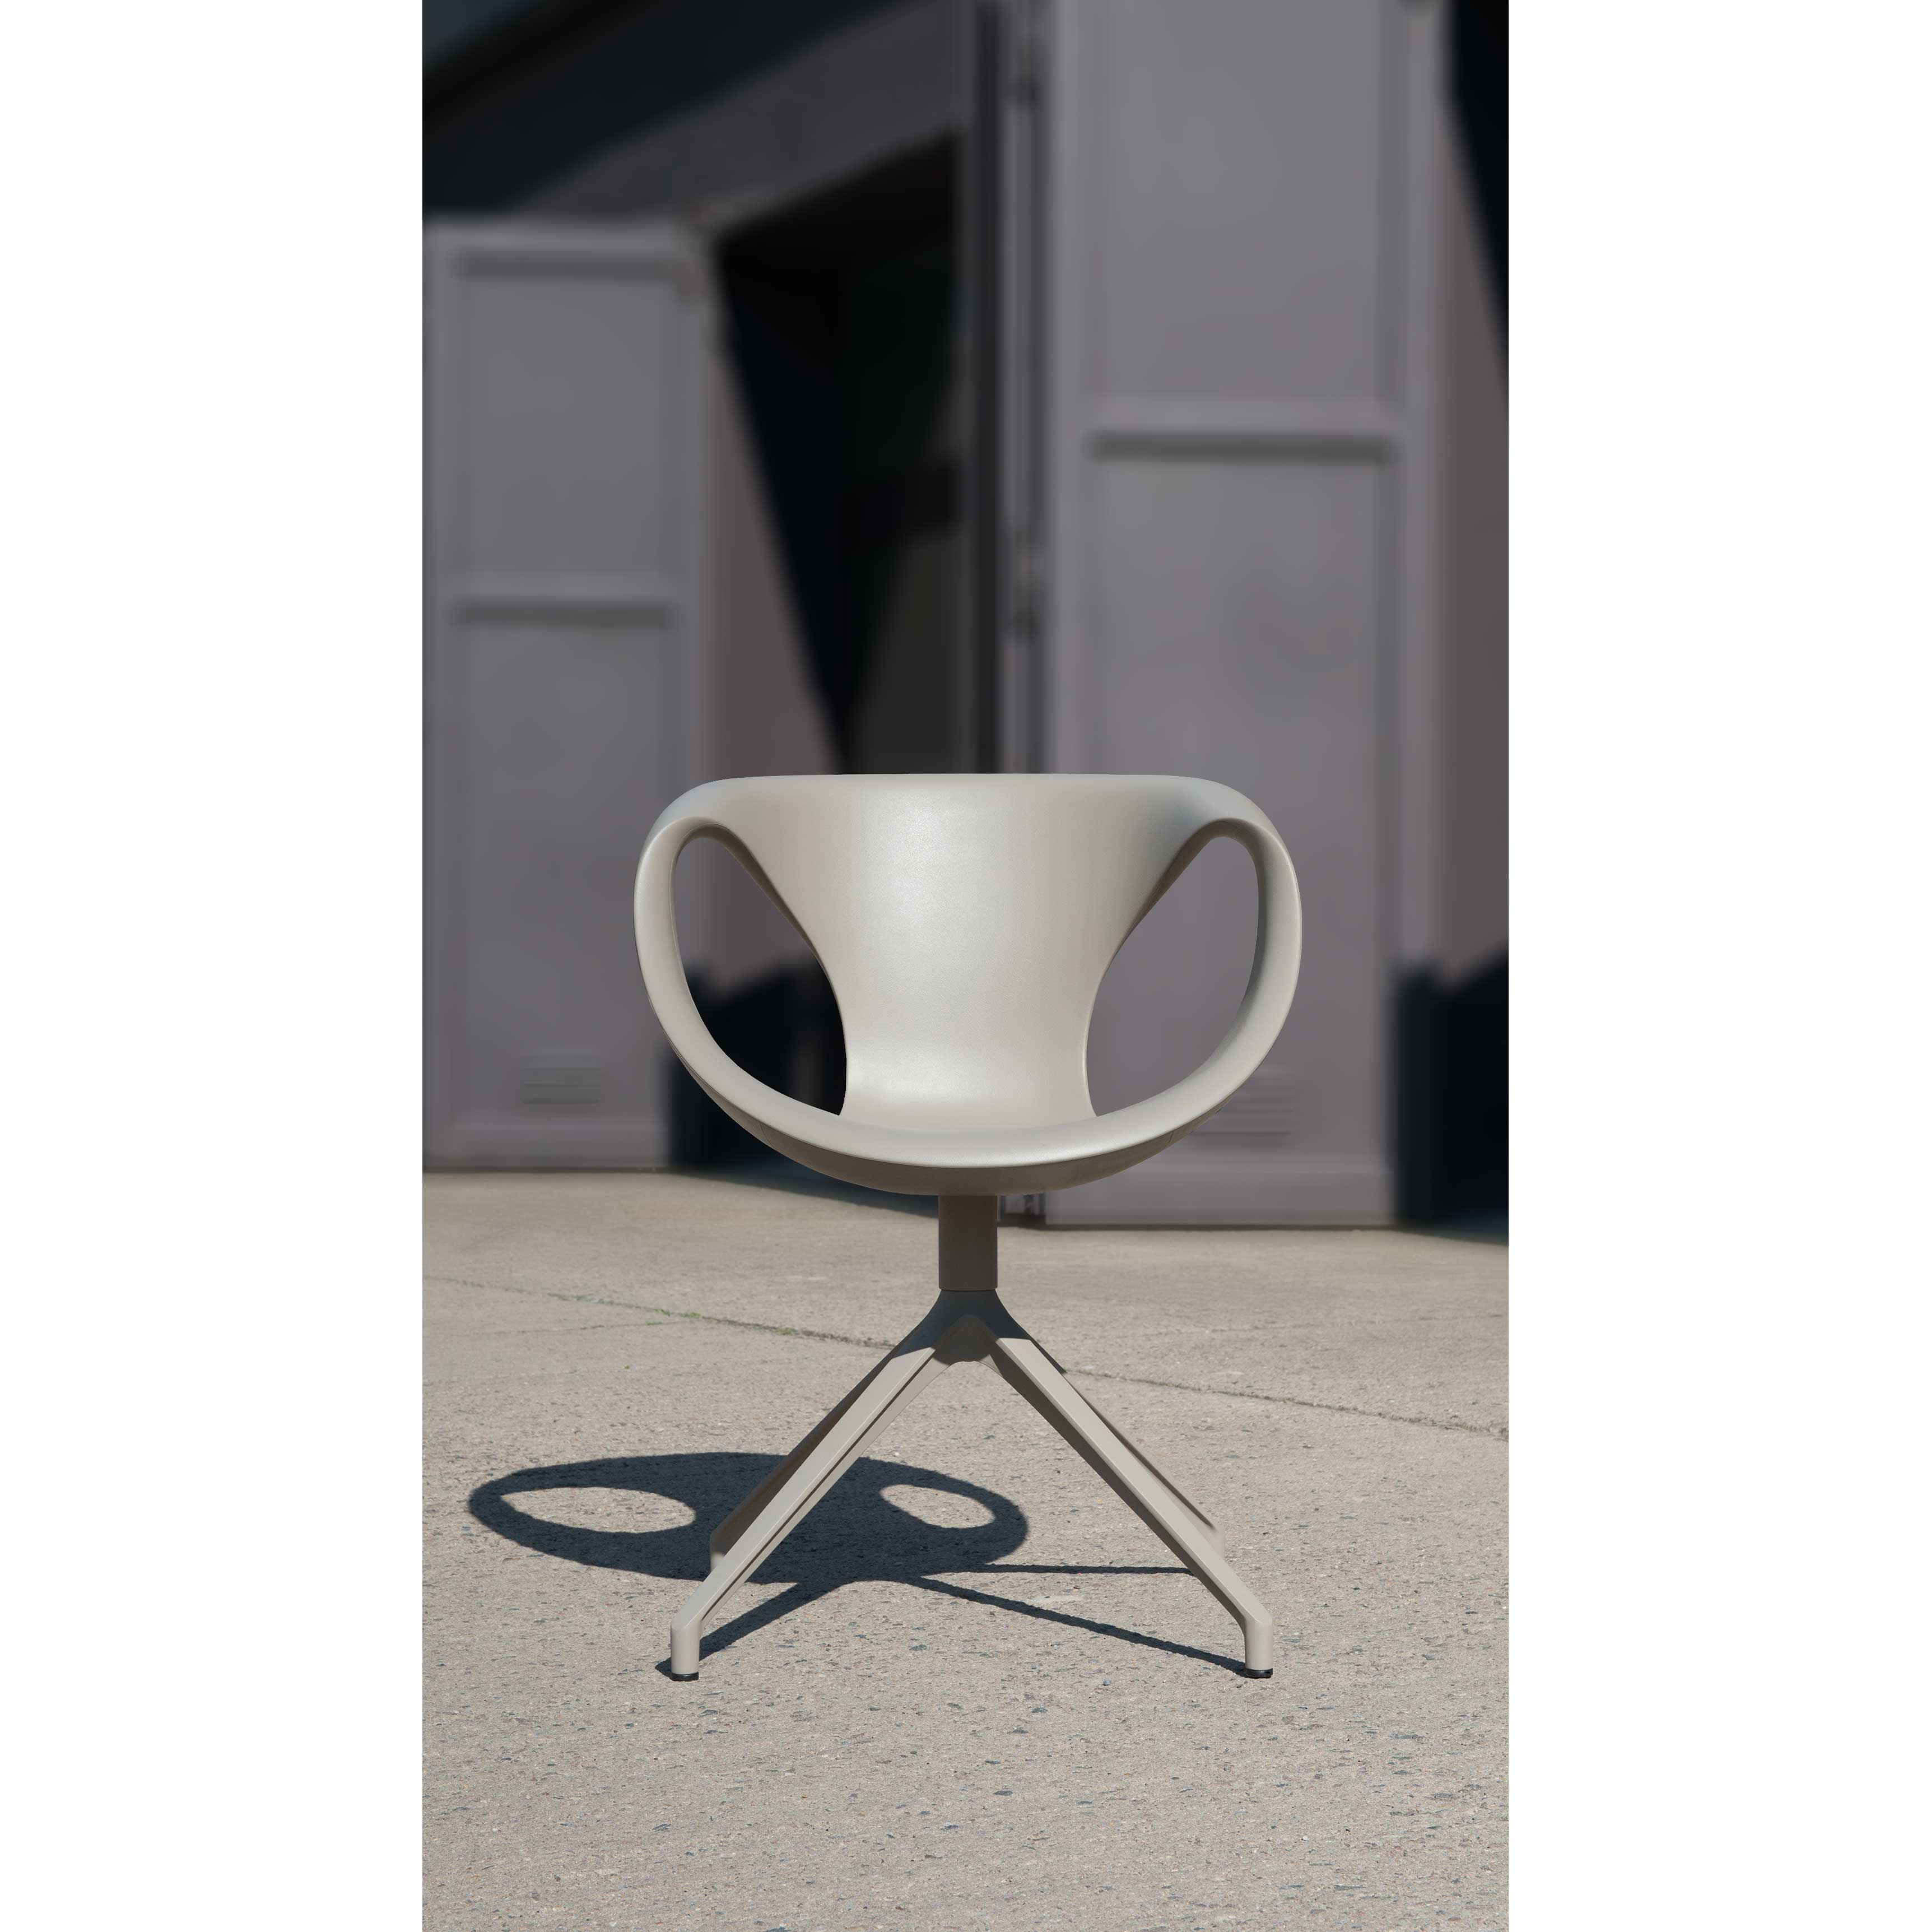 Tonon Up Chair 907 81 Designer Stuhl Schwenkbar Stuhl Design